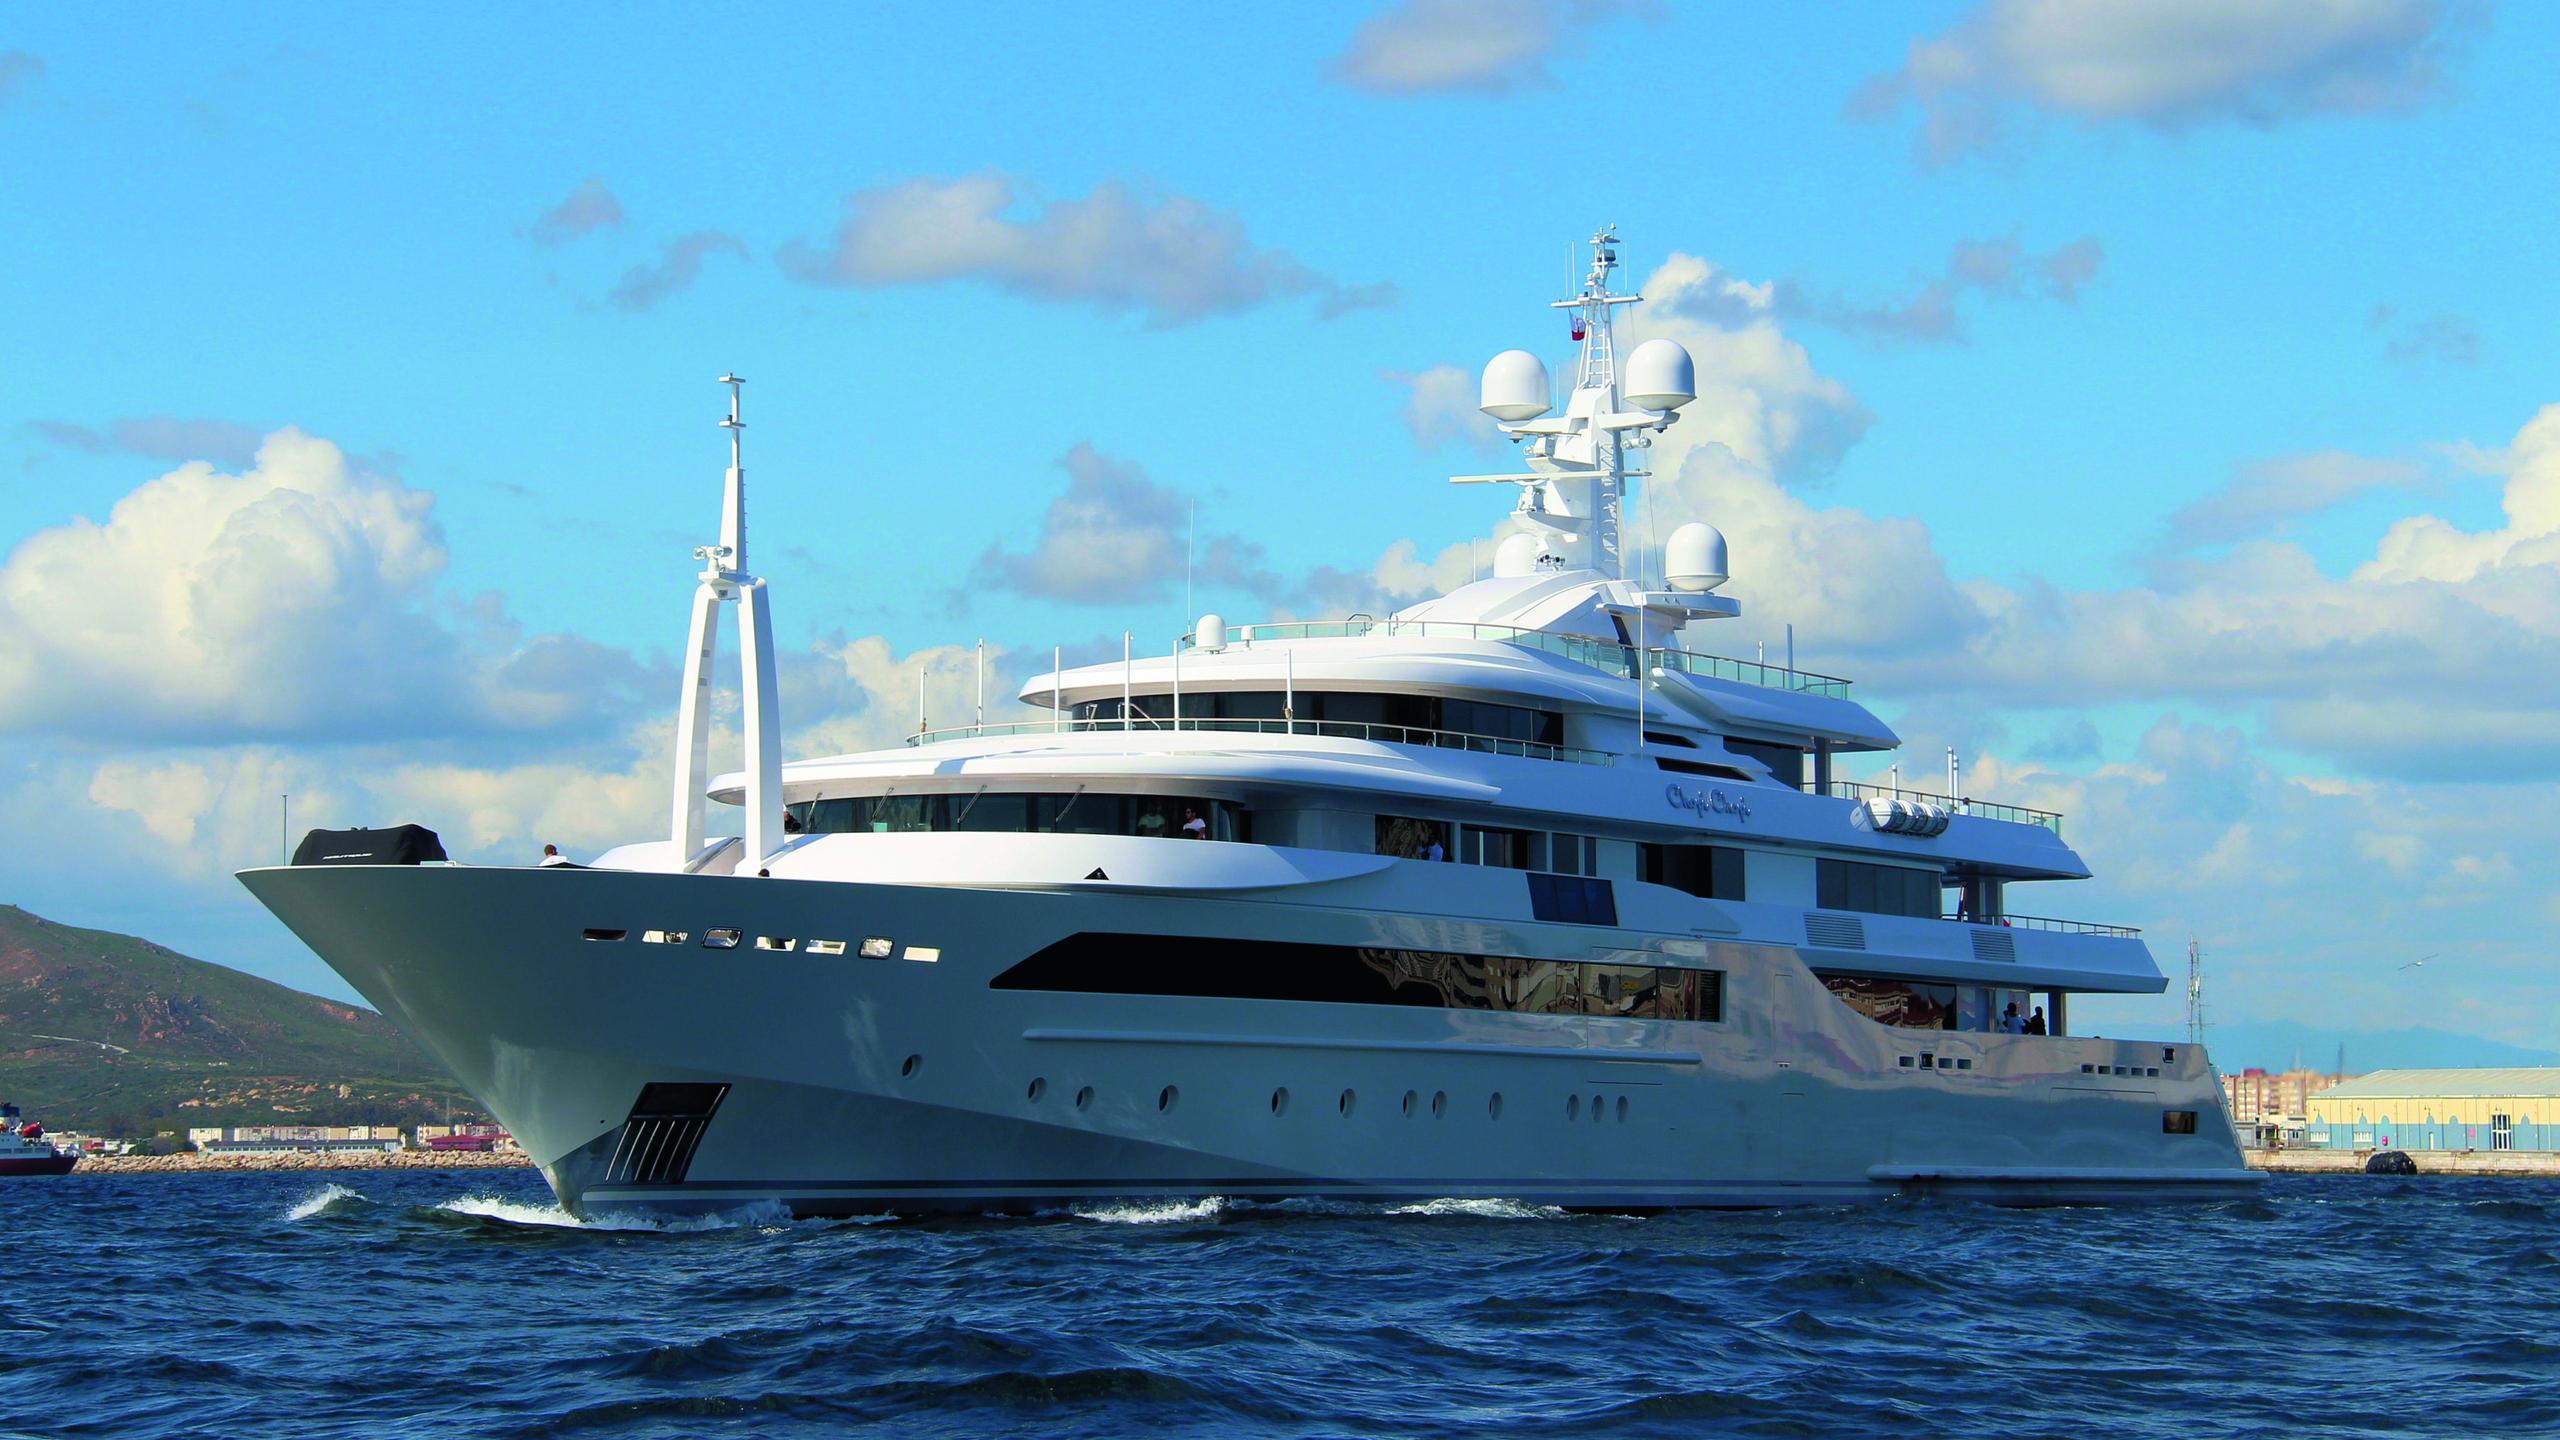 chopi-chopi-motor-yacht-crn-2013-80m-profile